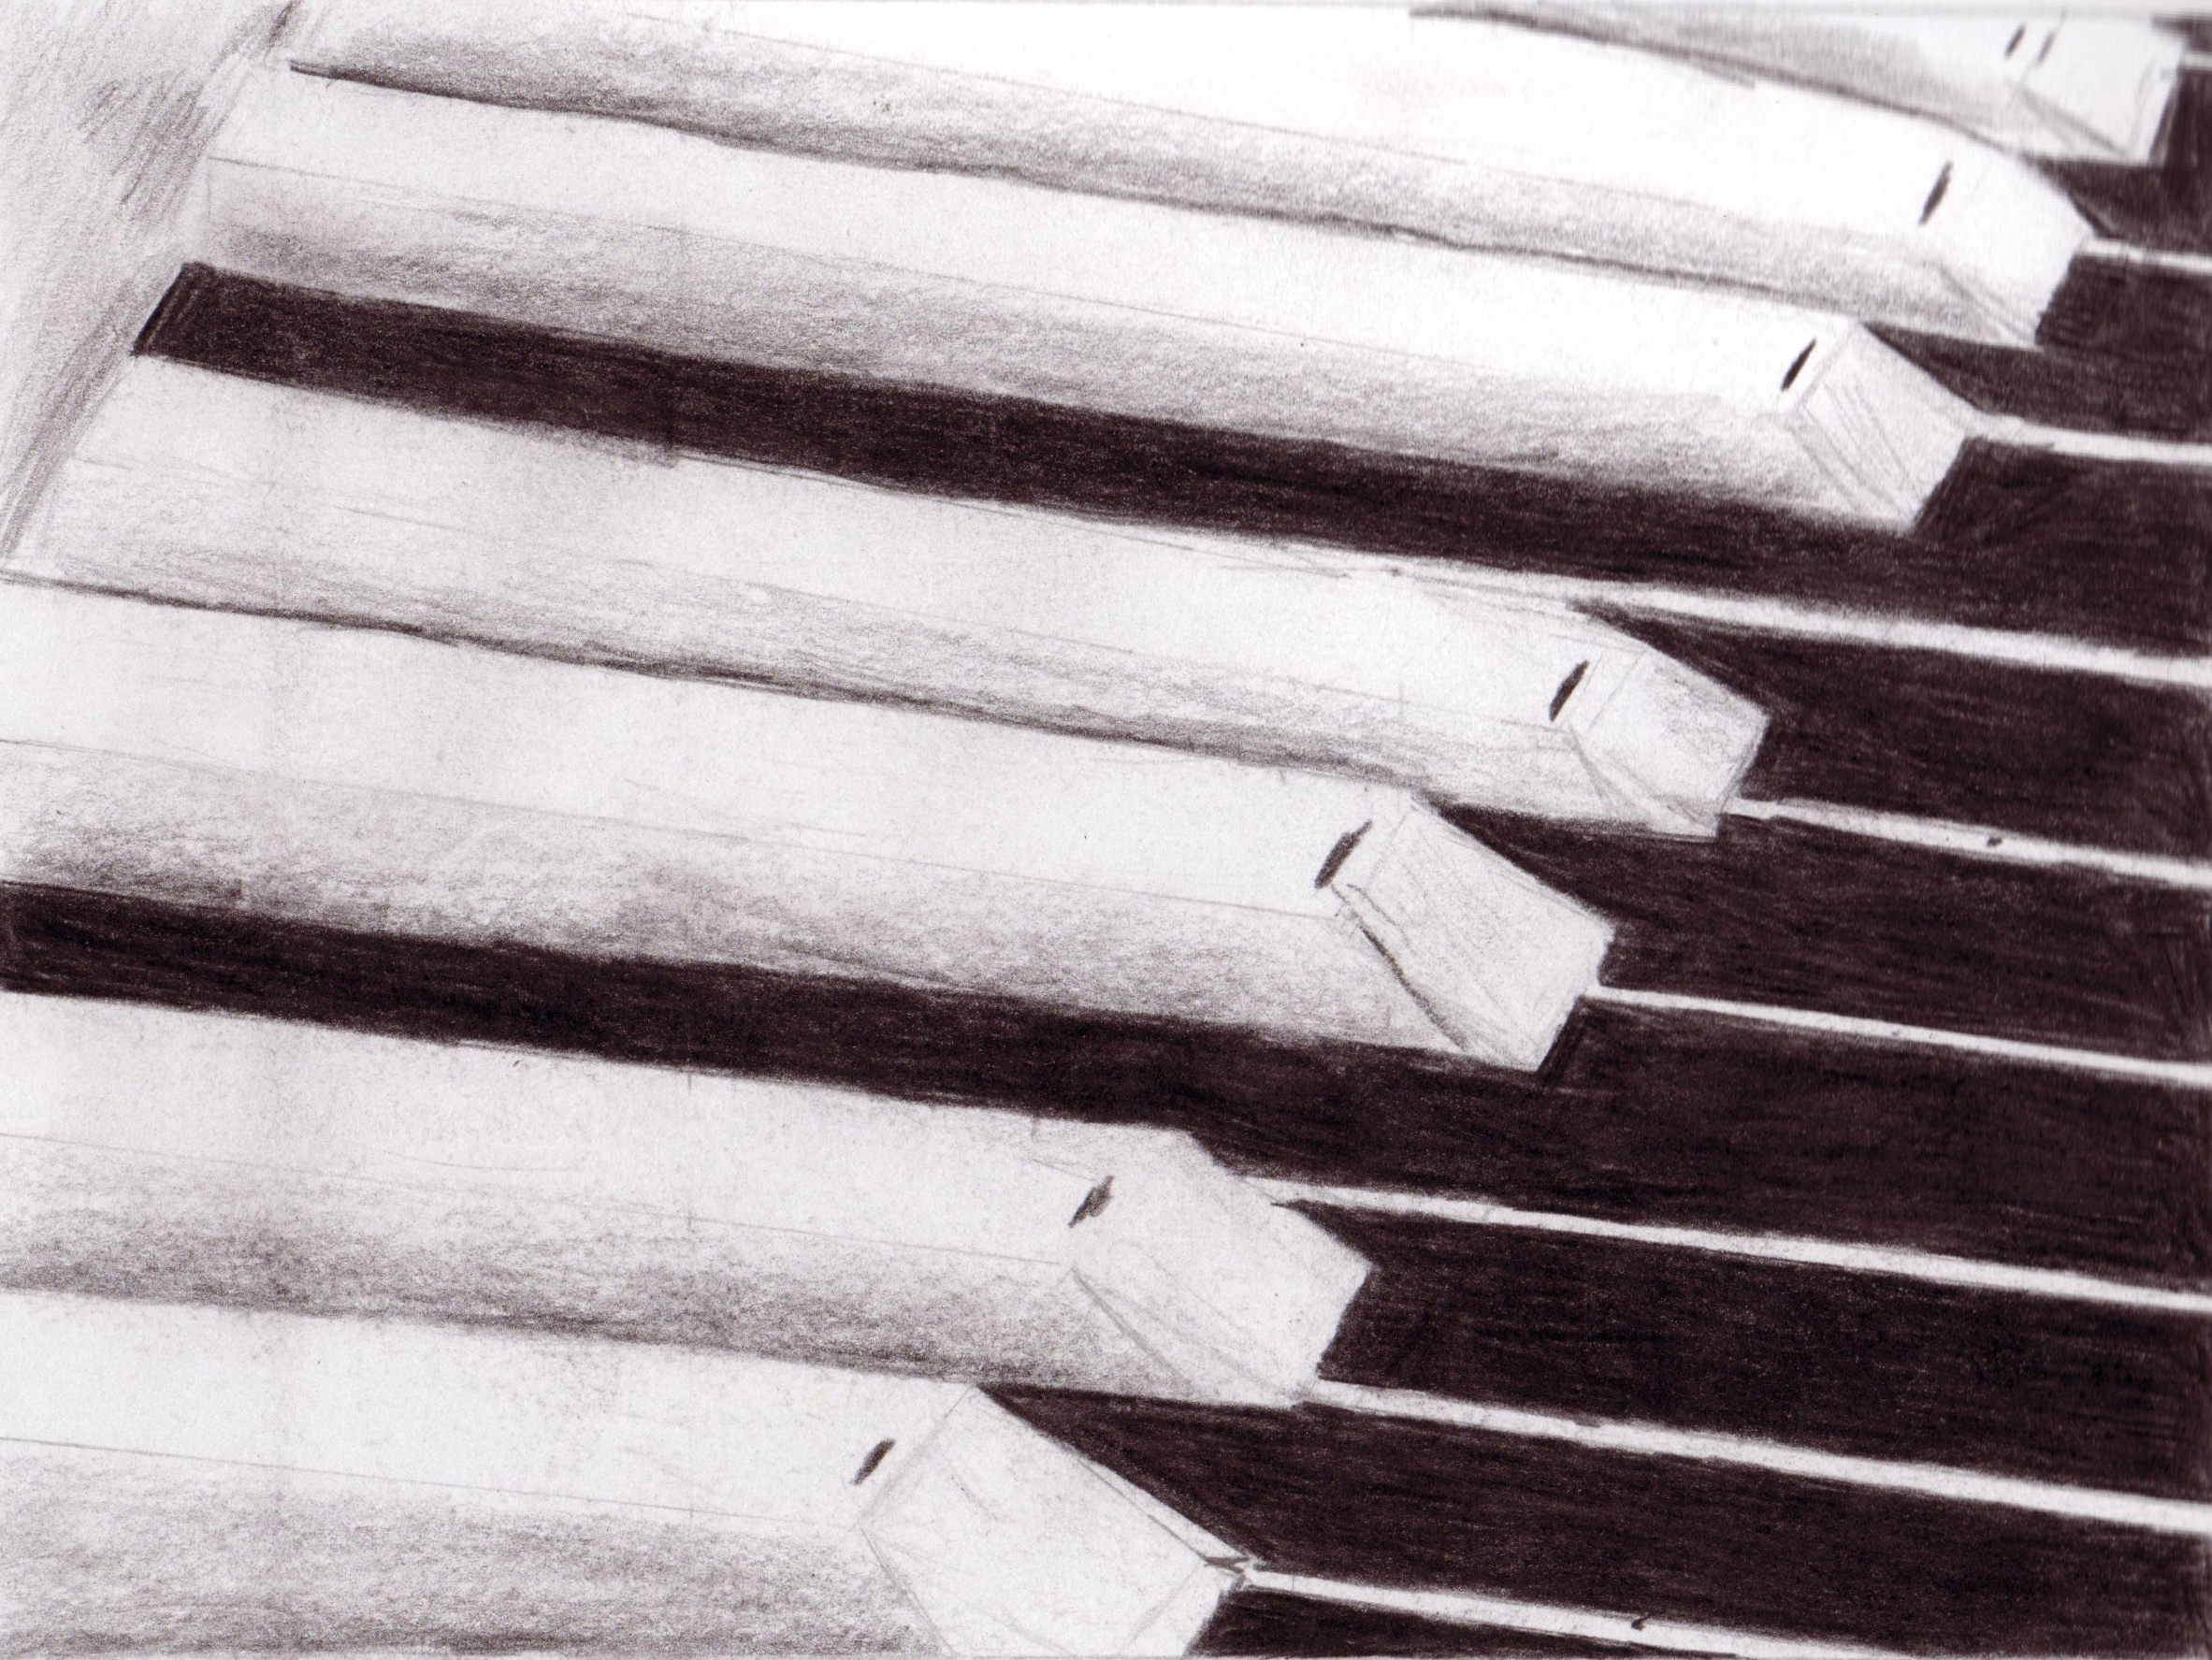 2365x1775 Piano Keys Contemplative Certainty